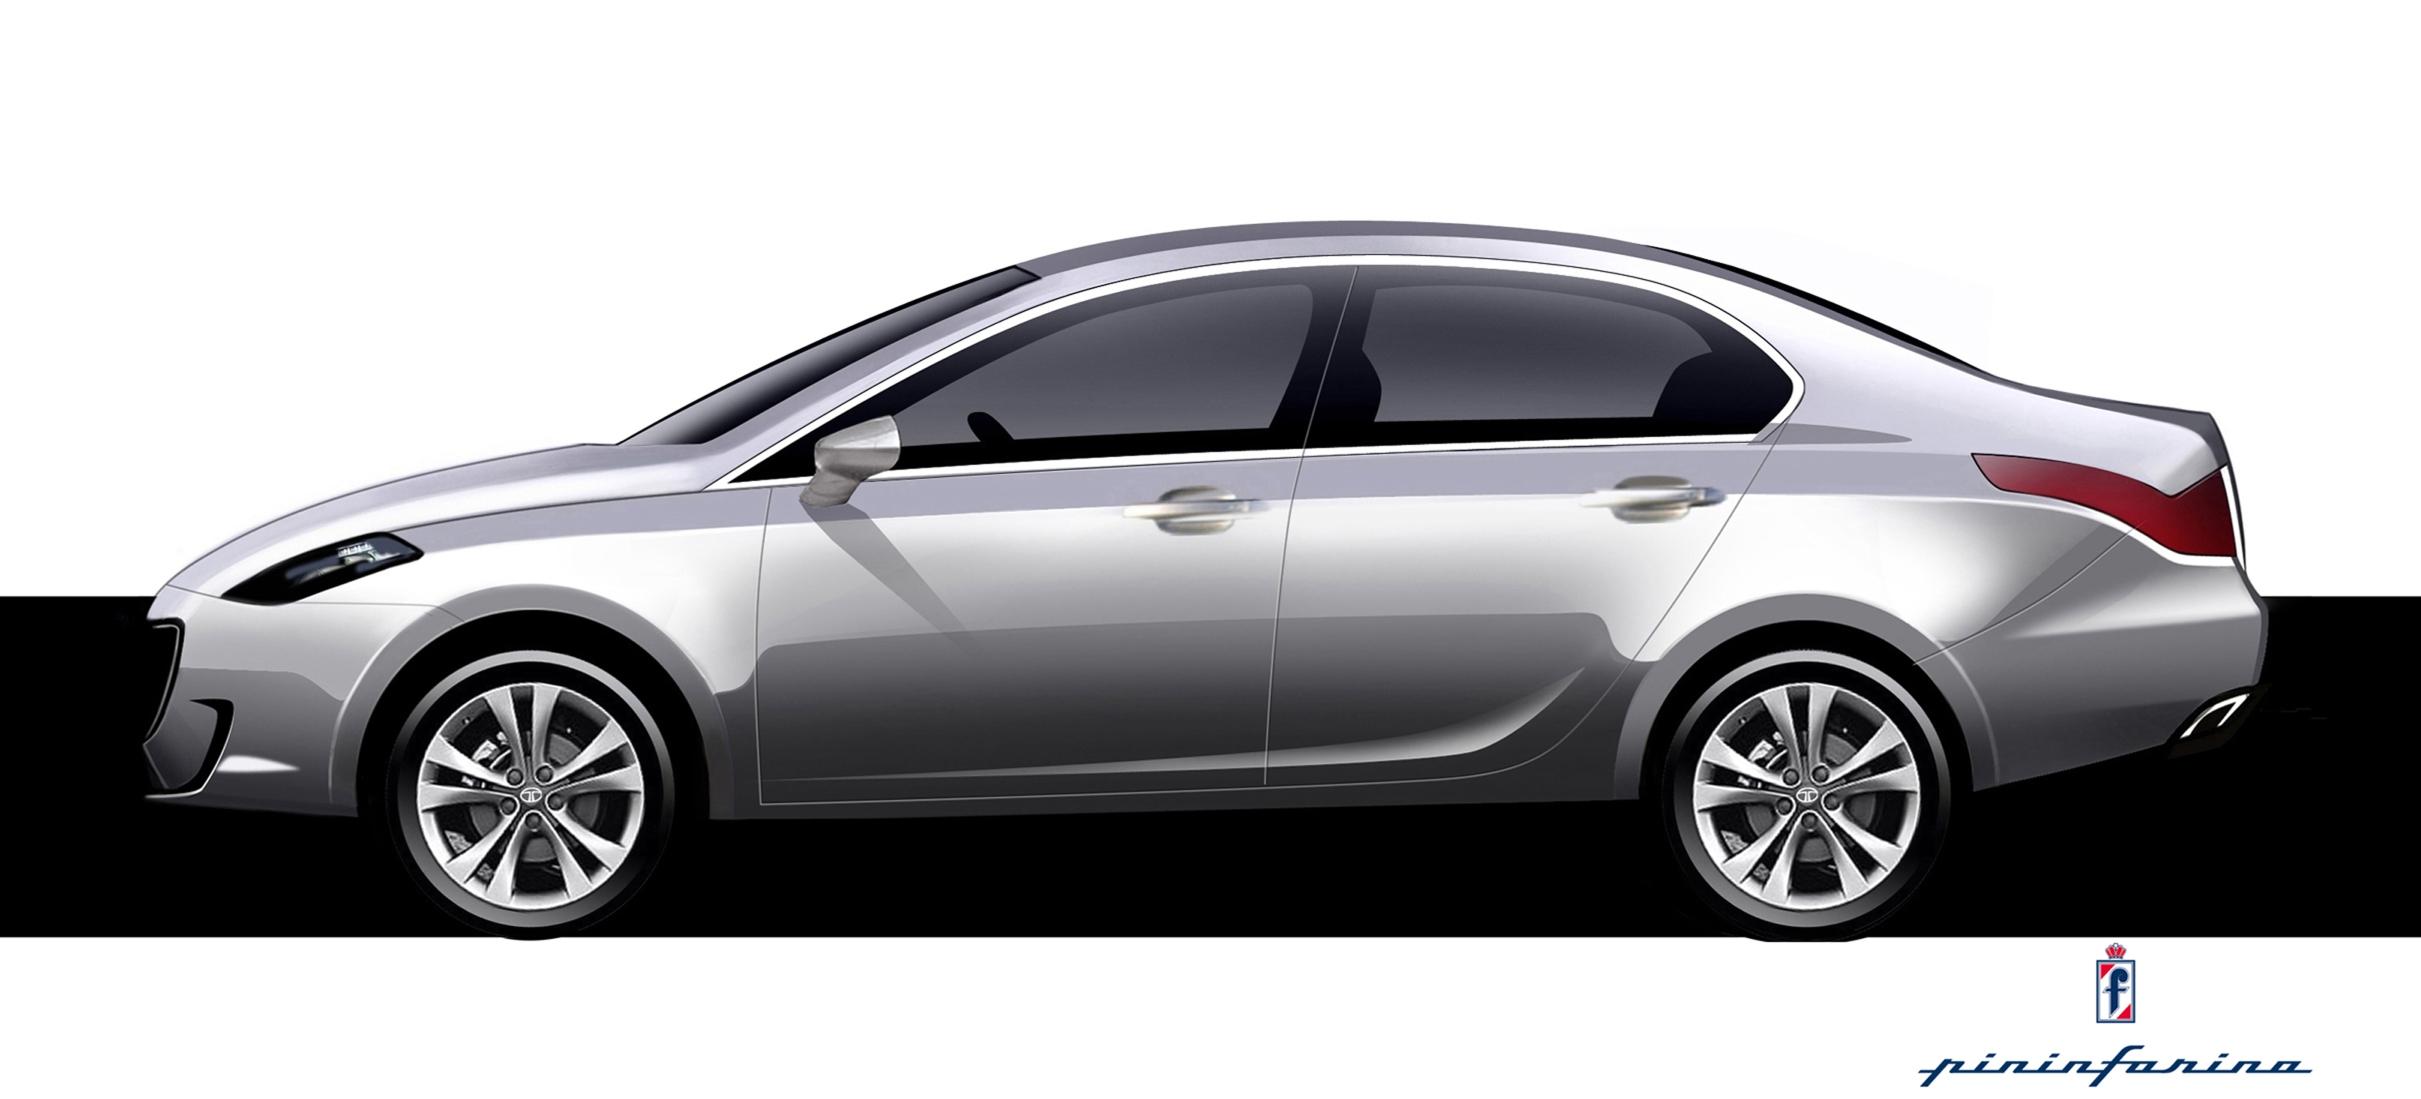 2009 >> 2009 Tata Pr1ma (Pininfarina) - Autokonzepte